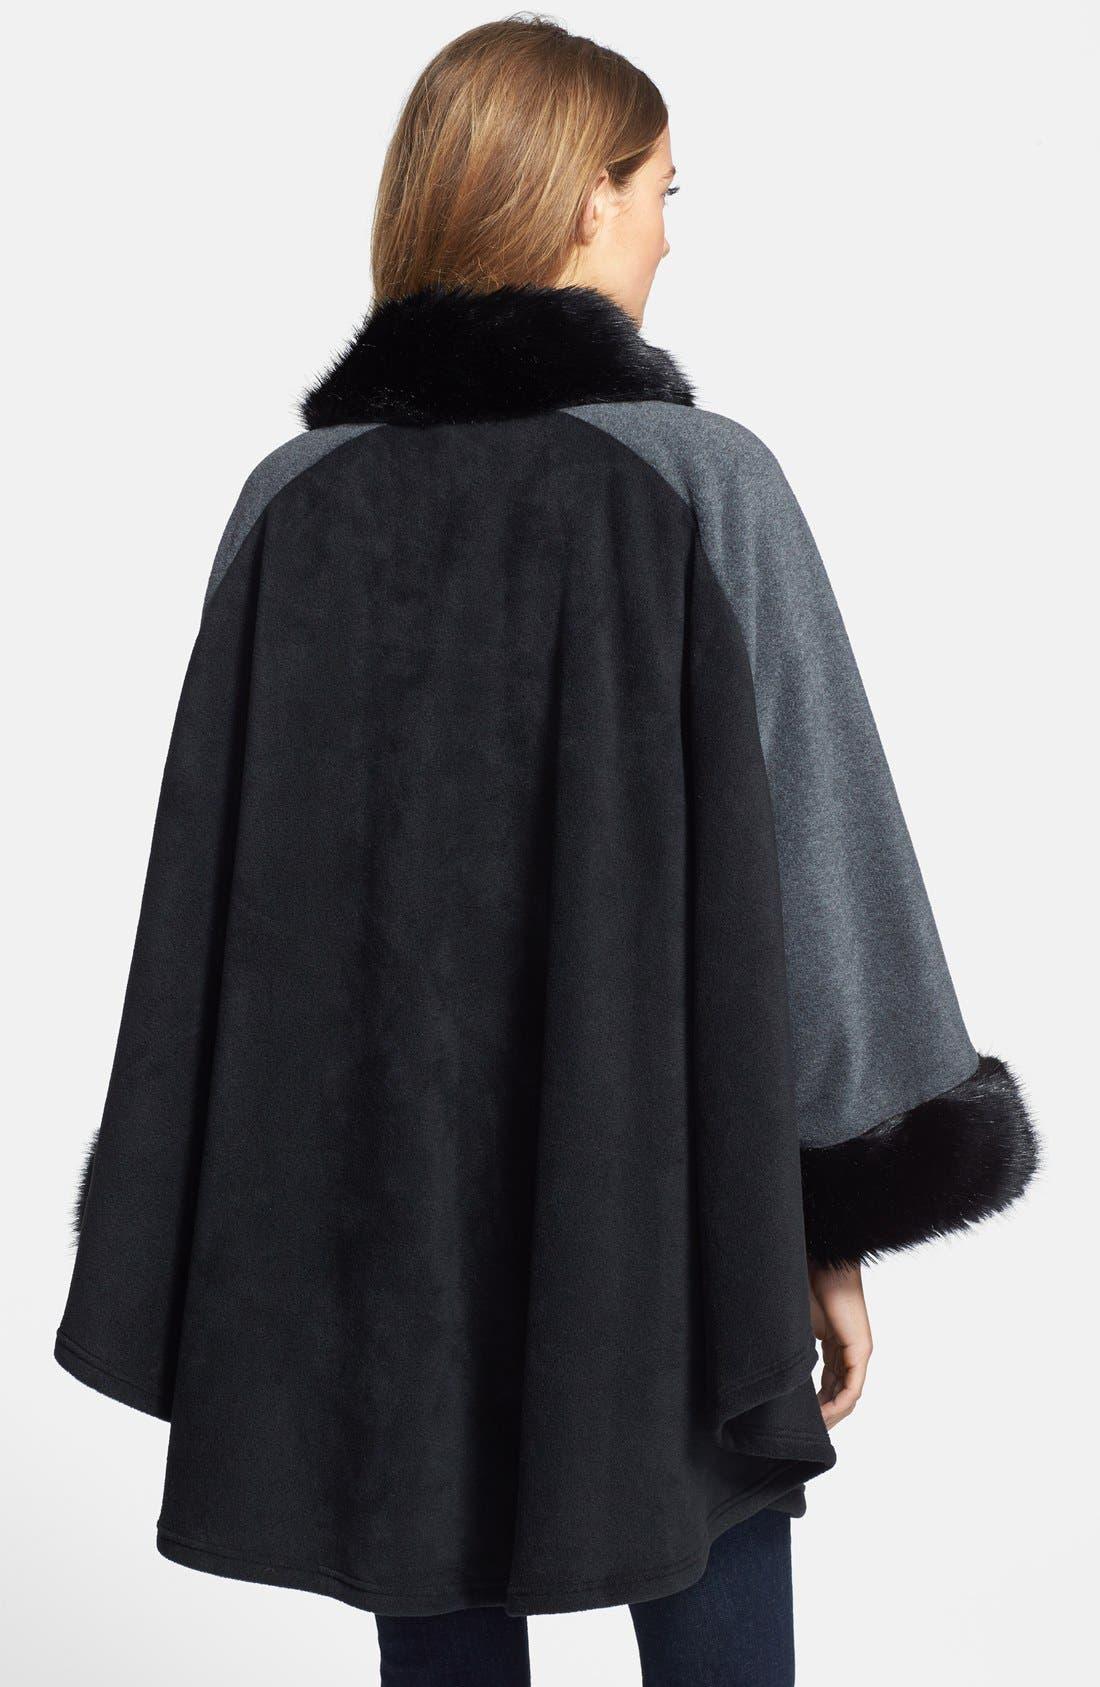 'Karina' Faux Fur Trim Cape,                             Alternate thumbnail 3, color,                             001